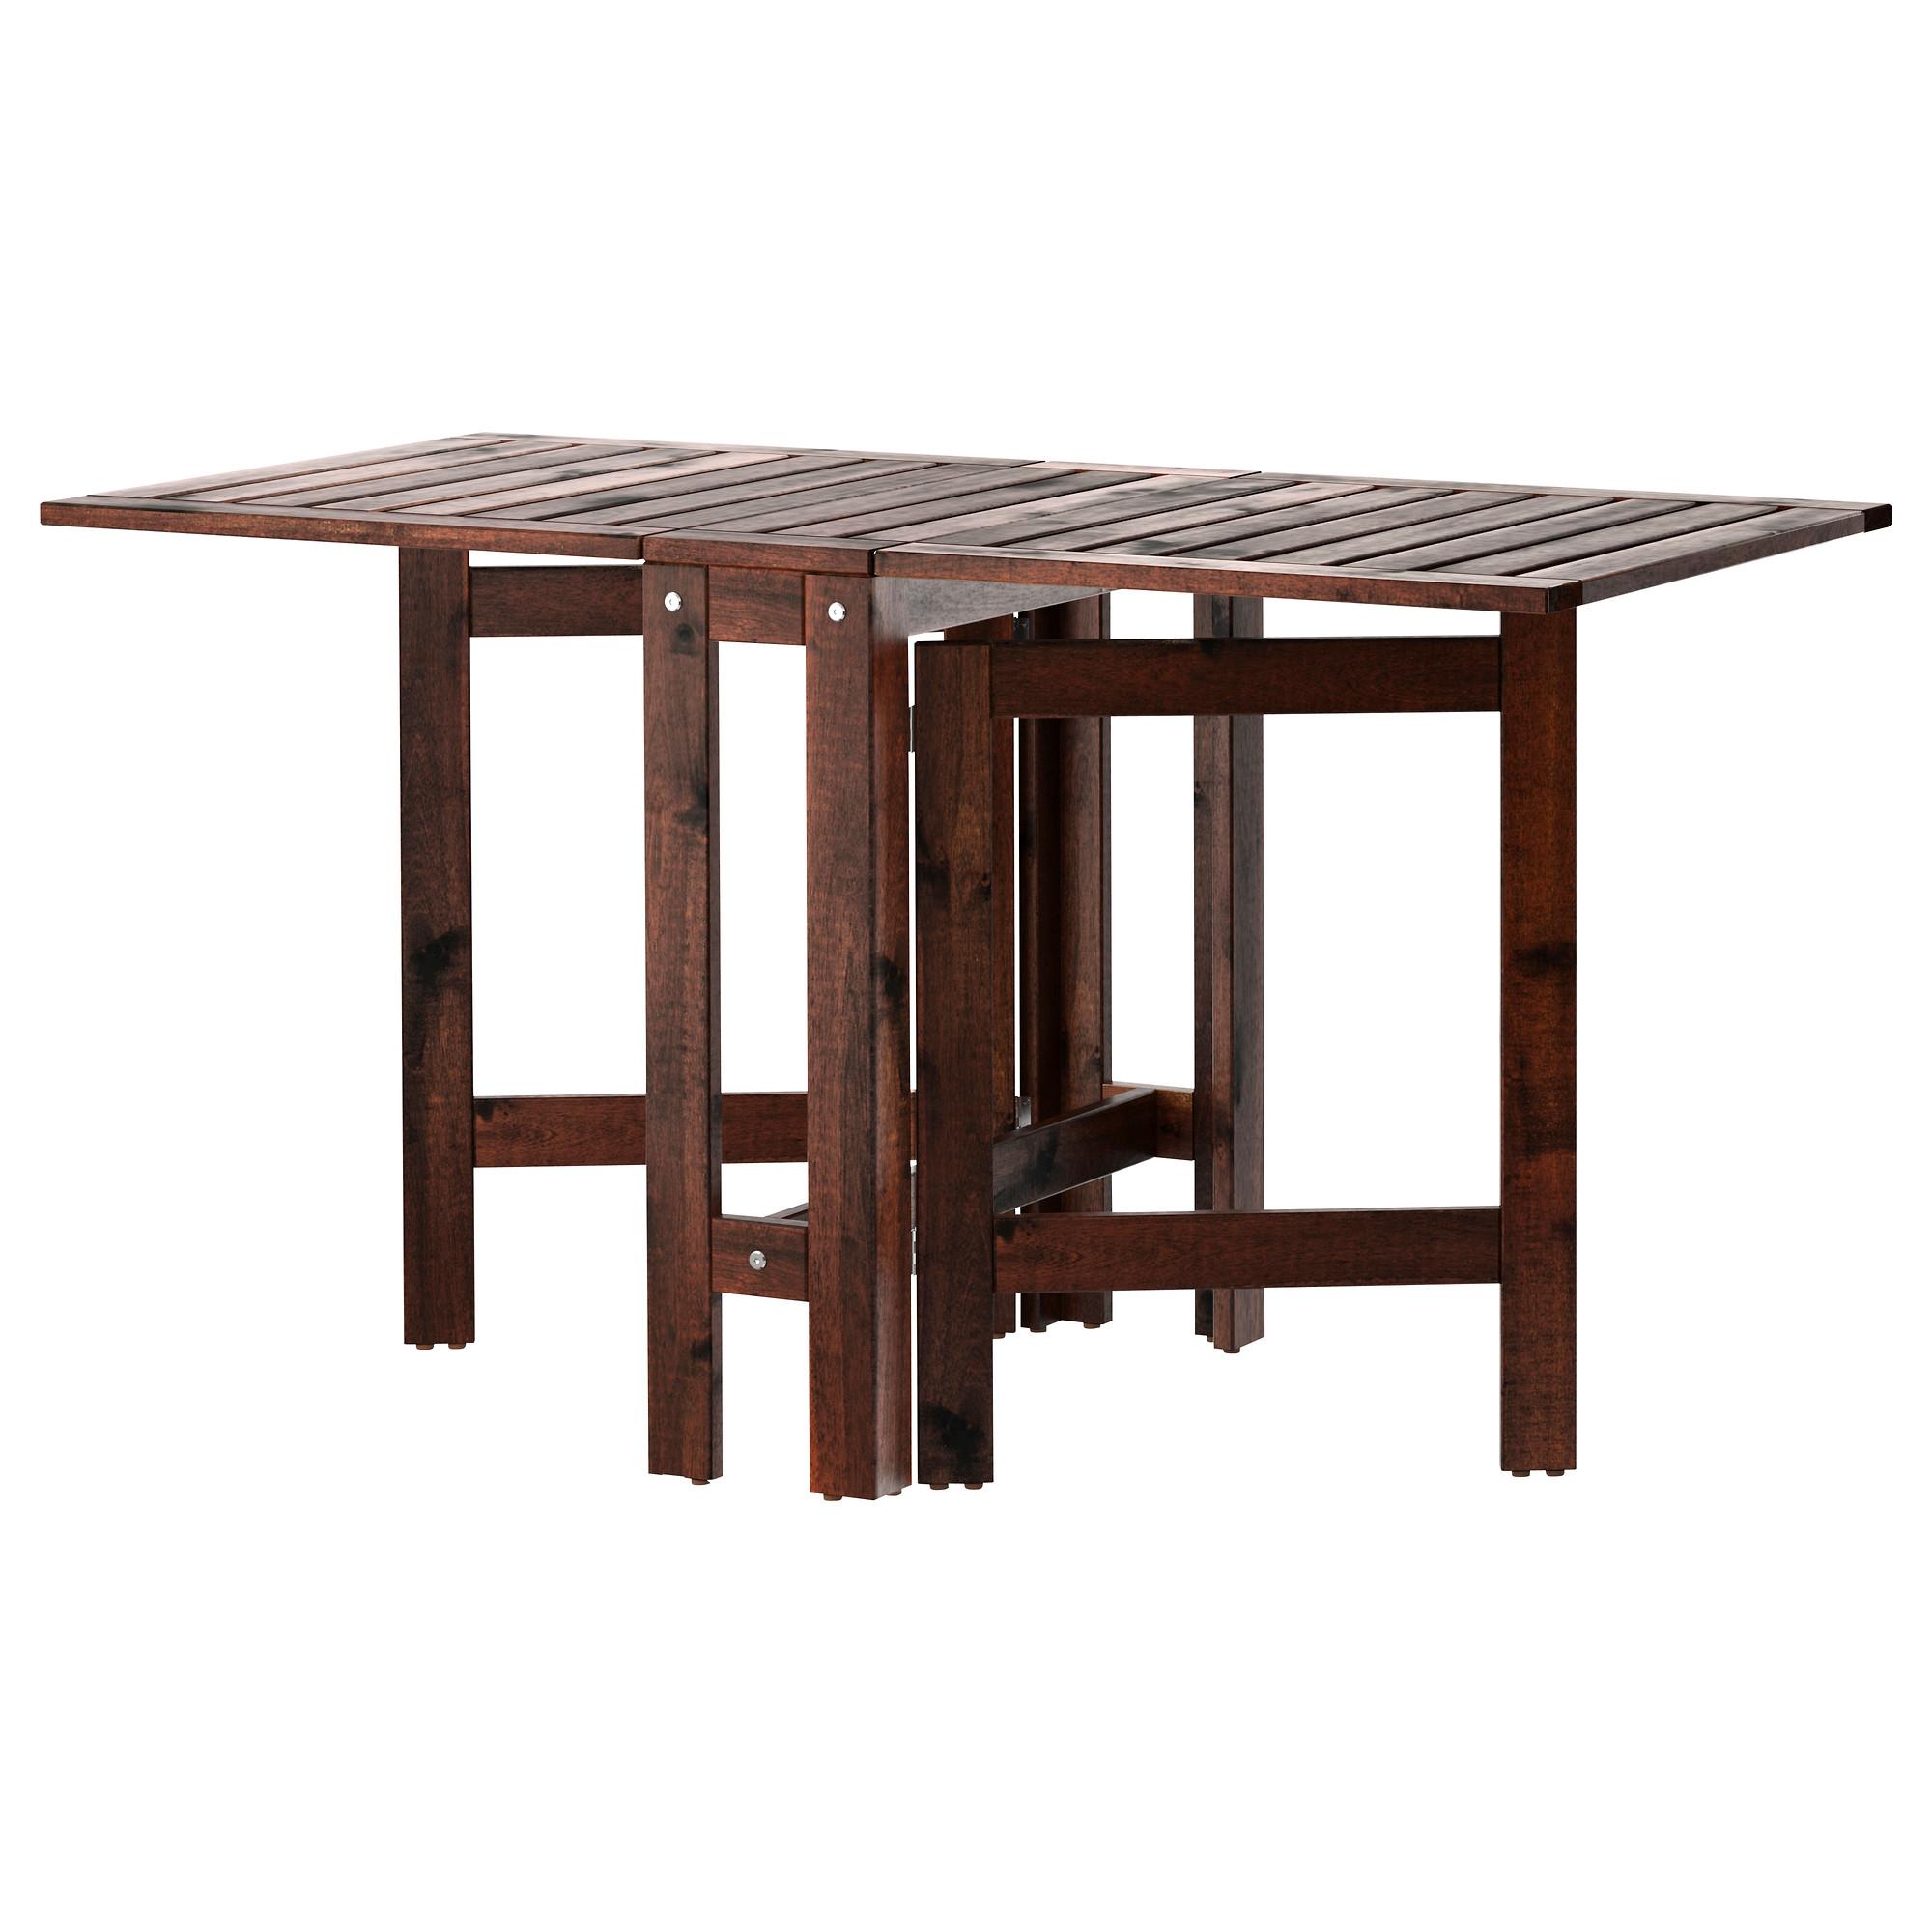 Pplar mesa plegable - Ikea mesas exterior ...